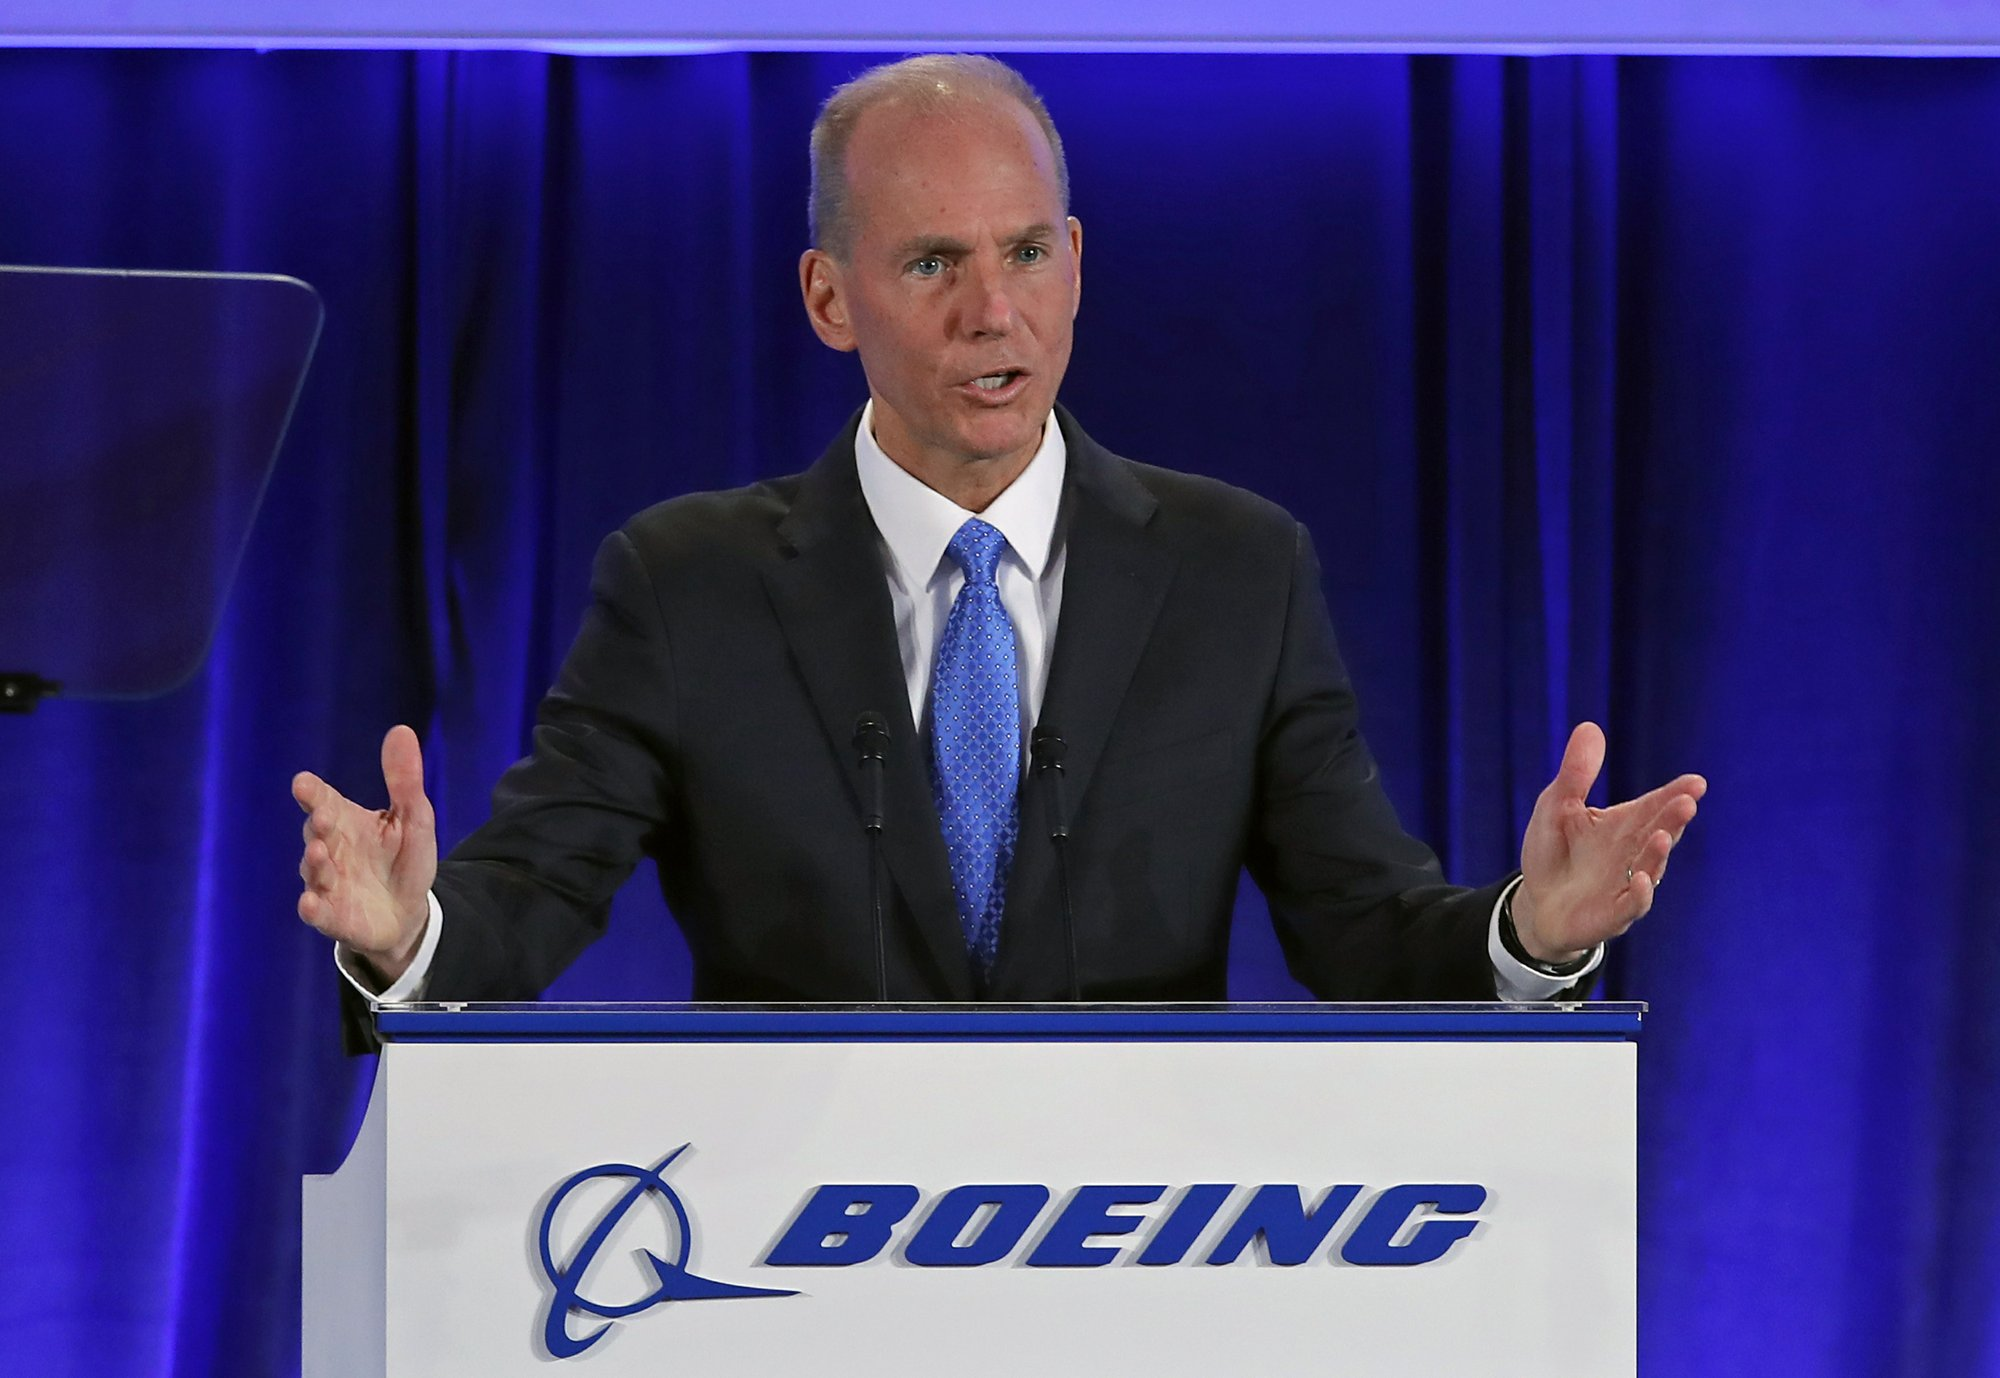 Boeing CEO.jpeg